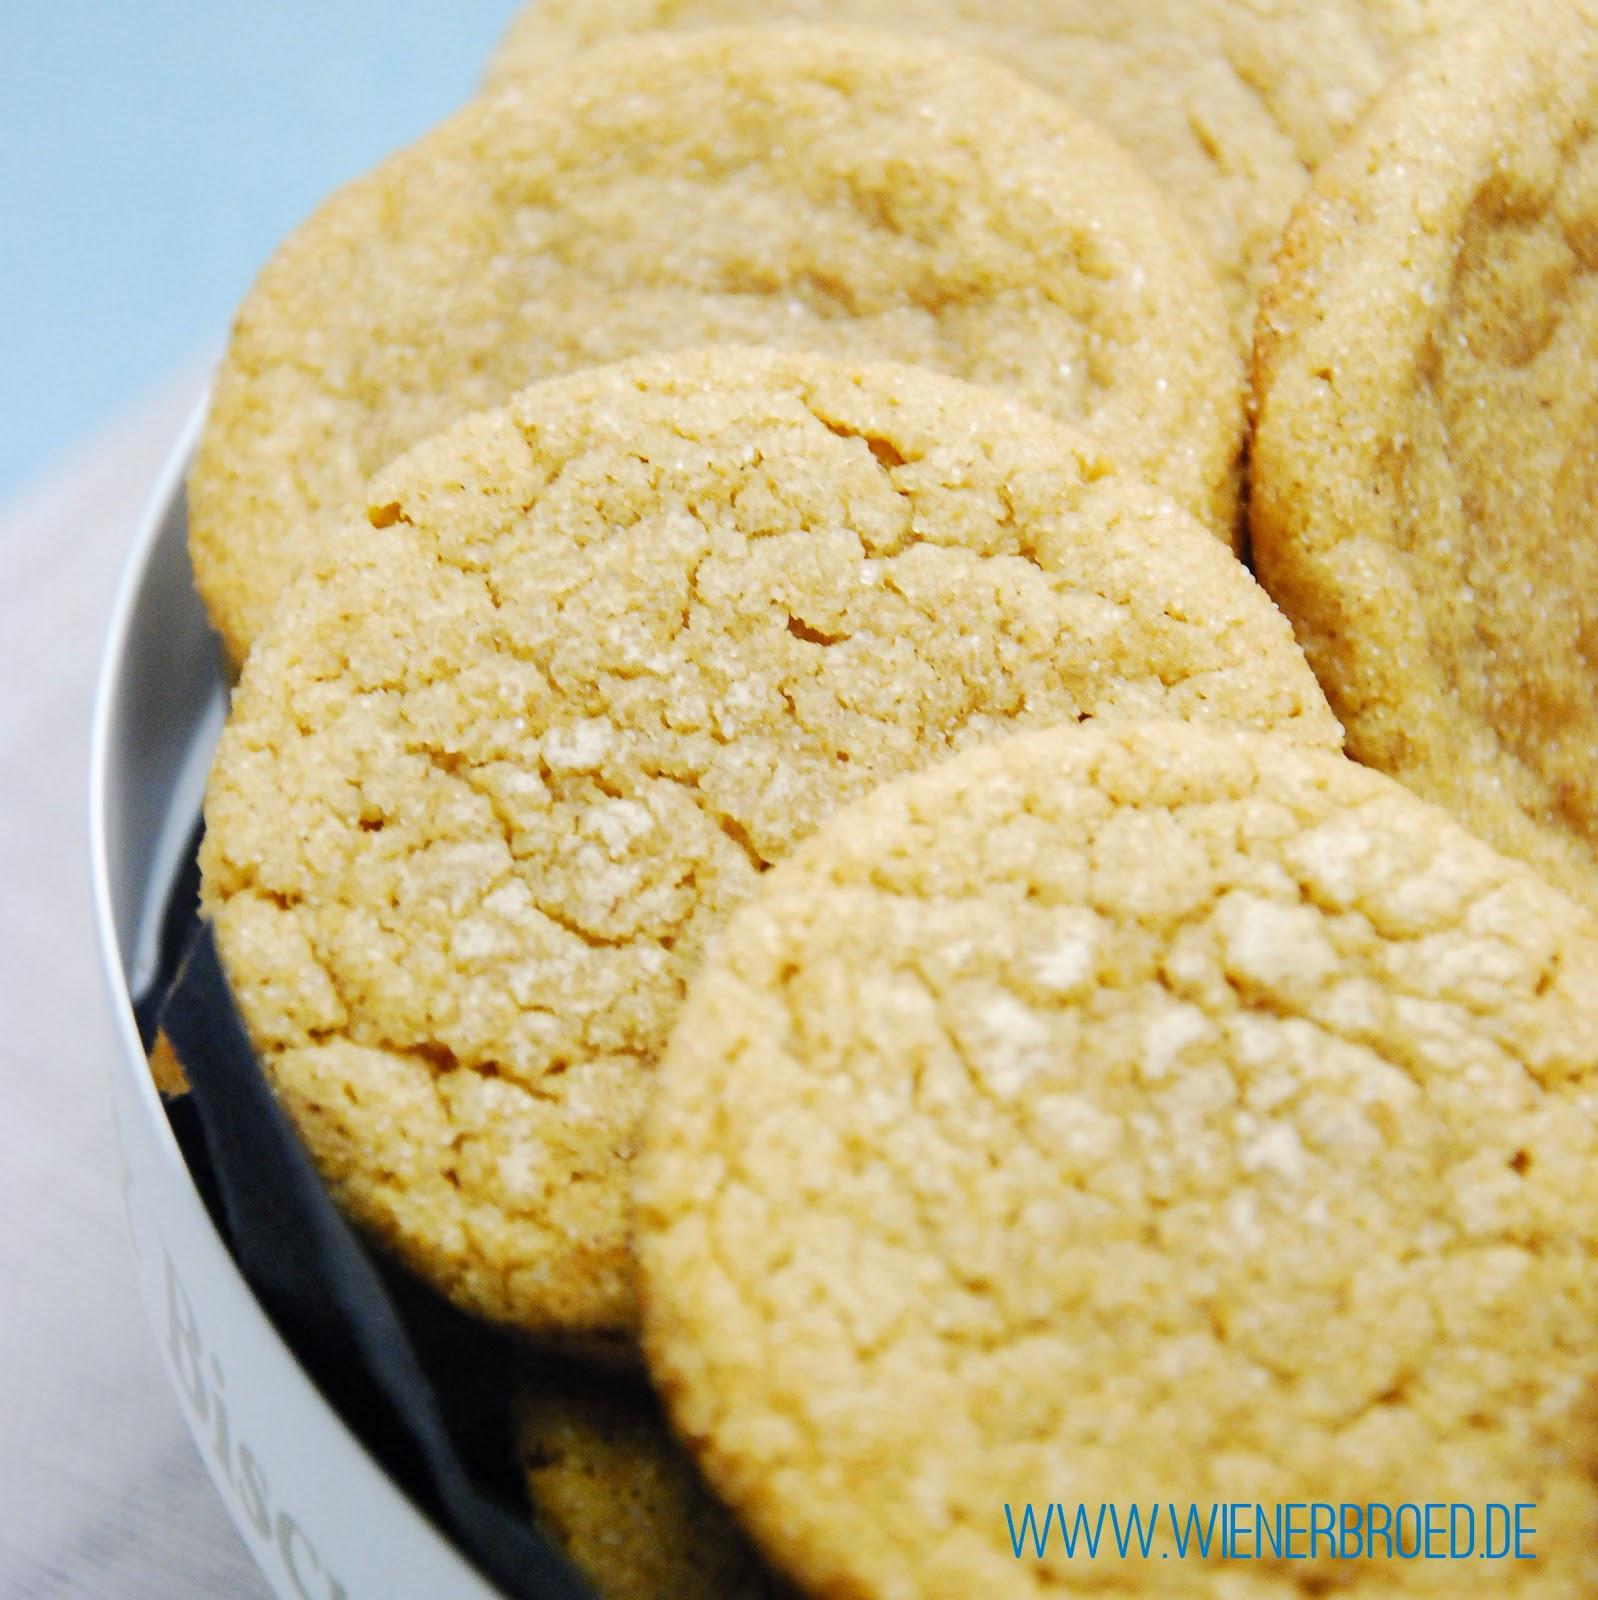 Snickerdoodles - Cookies with cinnamon-sugar crust